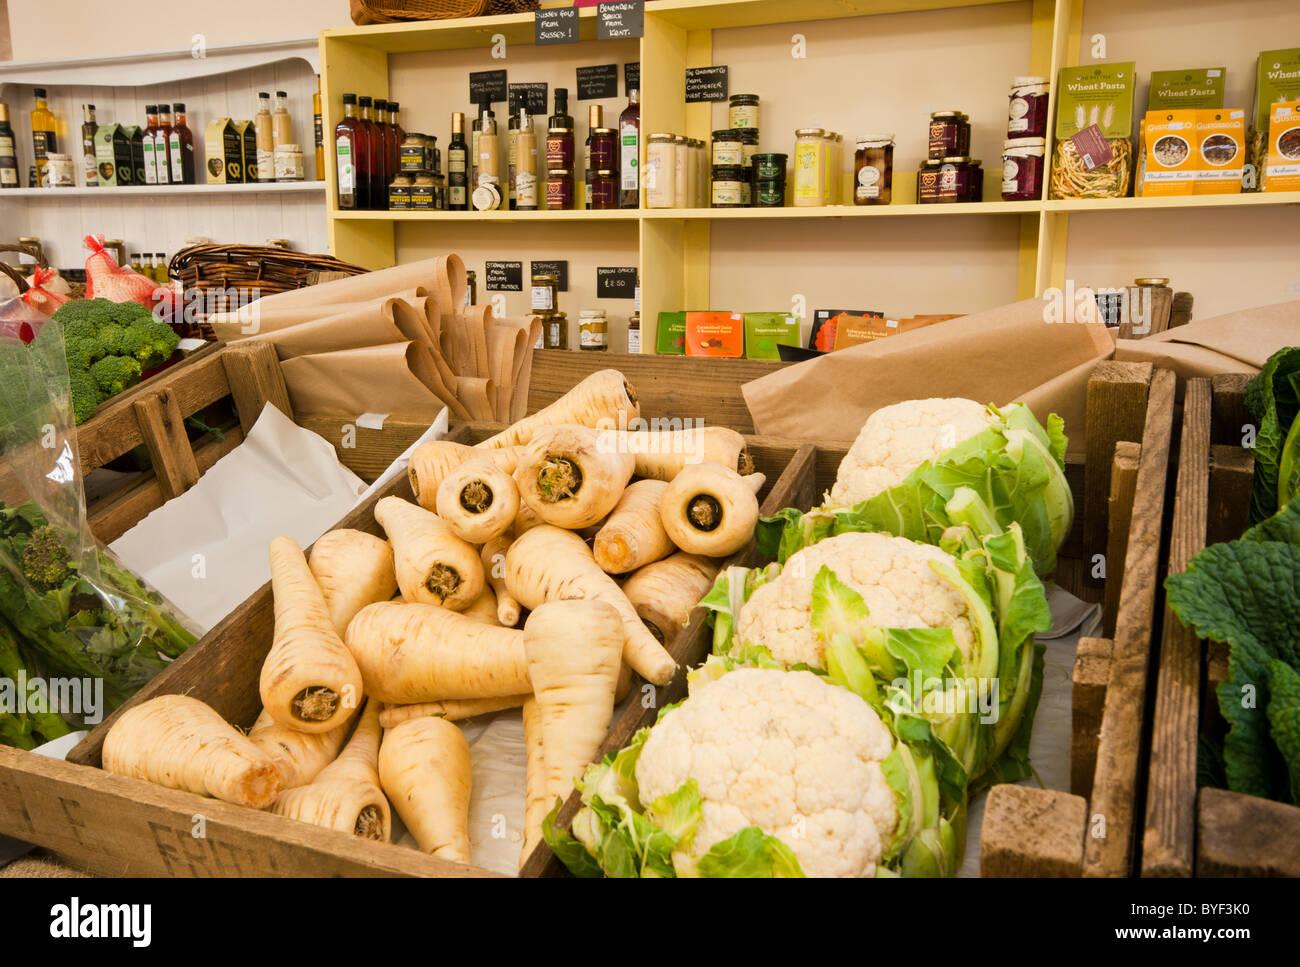 Fresh Farm Produce On Display In A Farm Shop - Stock Image